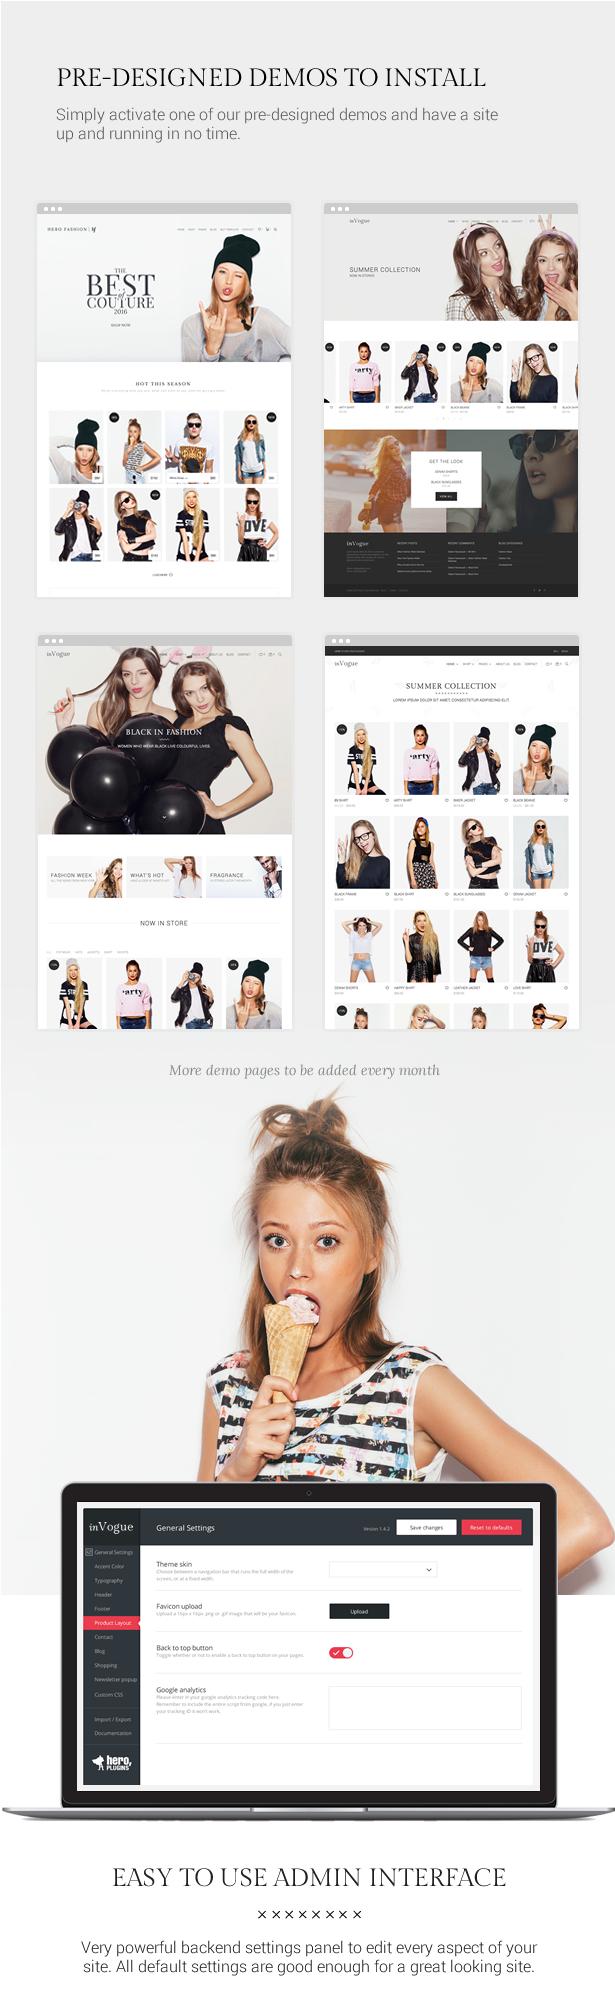 inVogue - WordPress Fashion Shopping Theme - 8